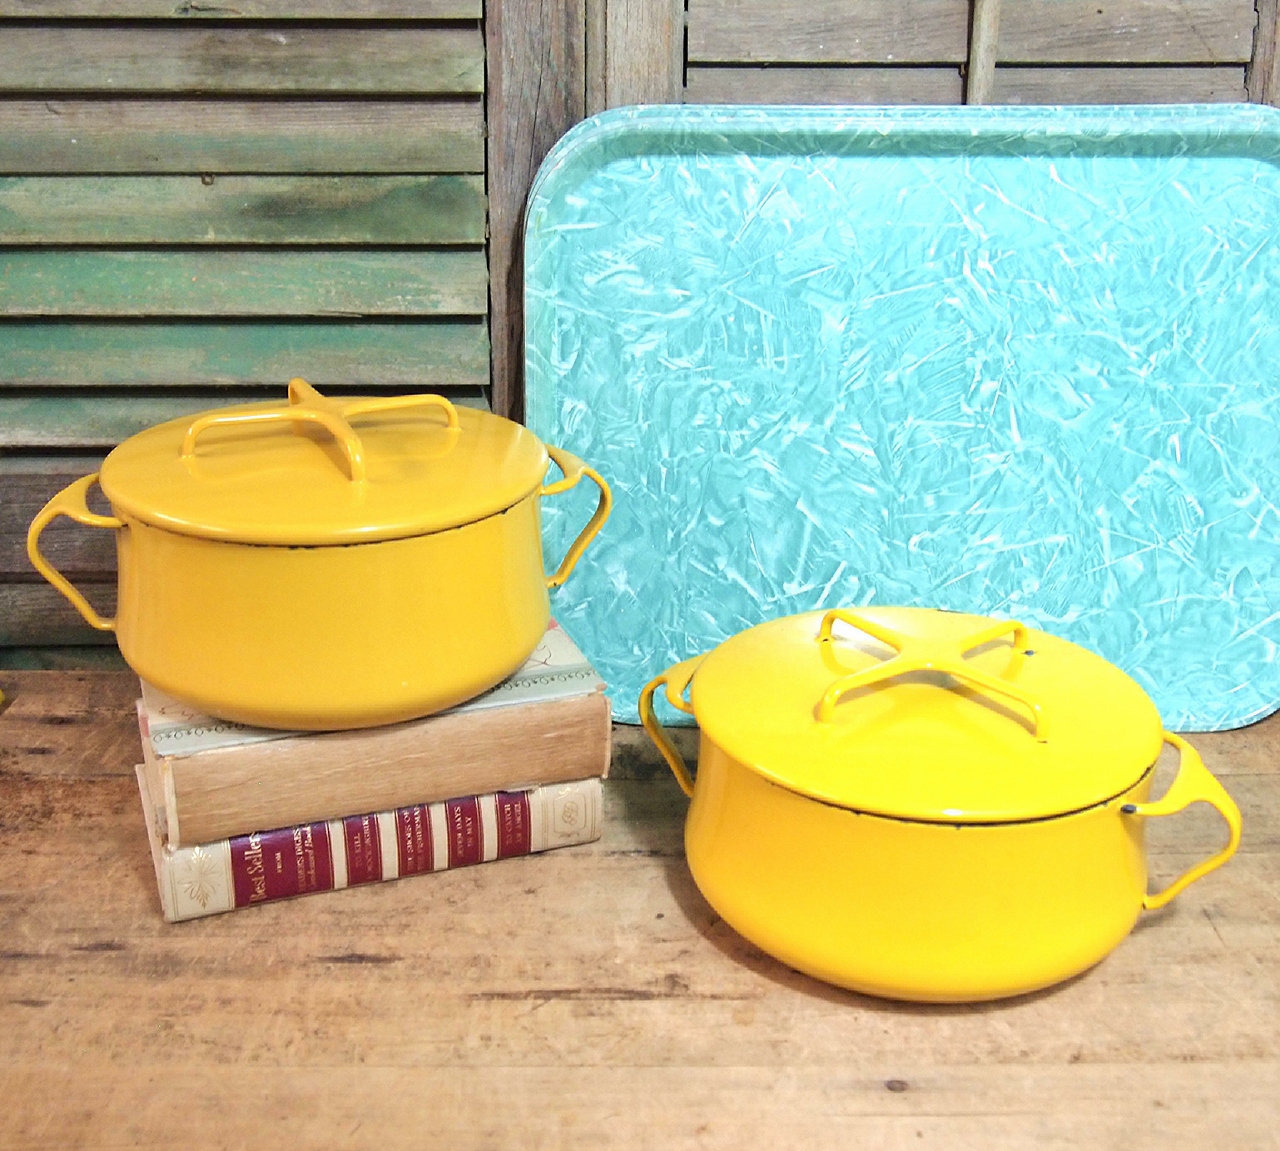 Lot of 2 Vintage Kobenstyle Dansk Mid-Century Modern Yellow Enamel Dutch Oven